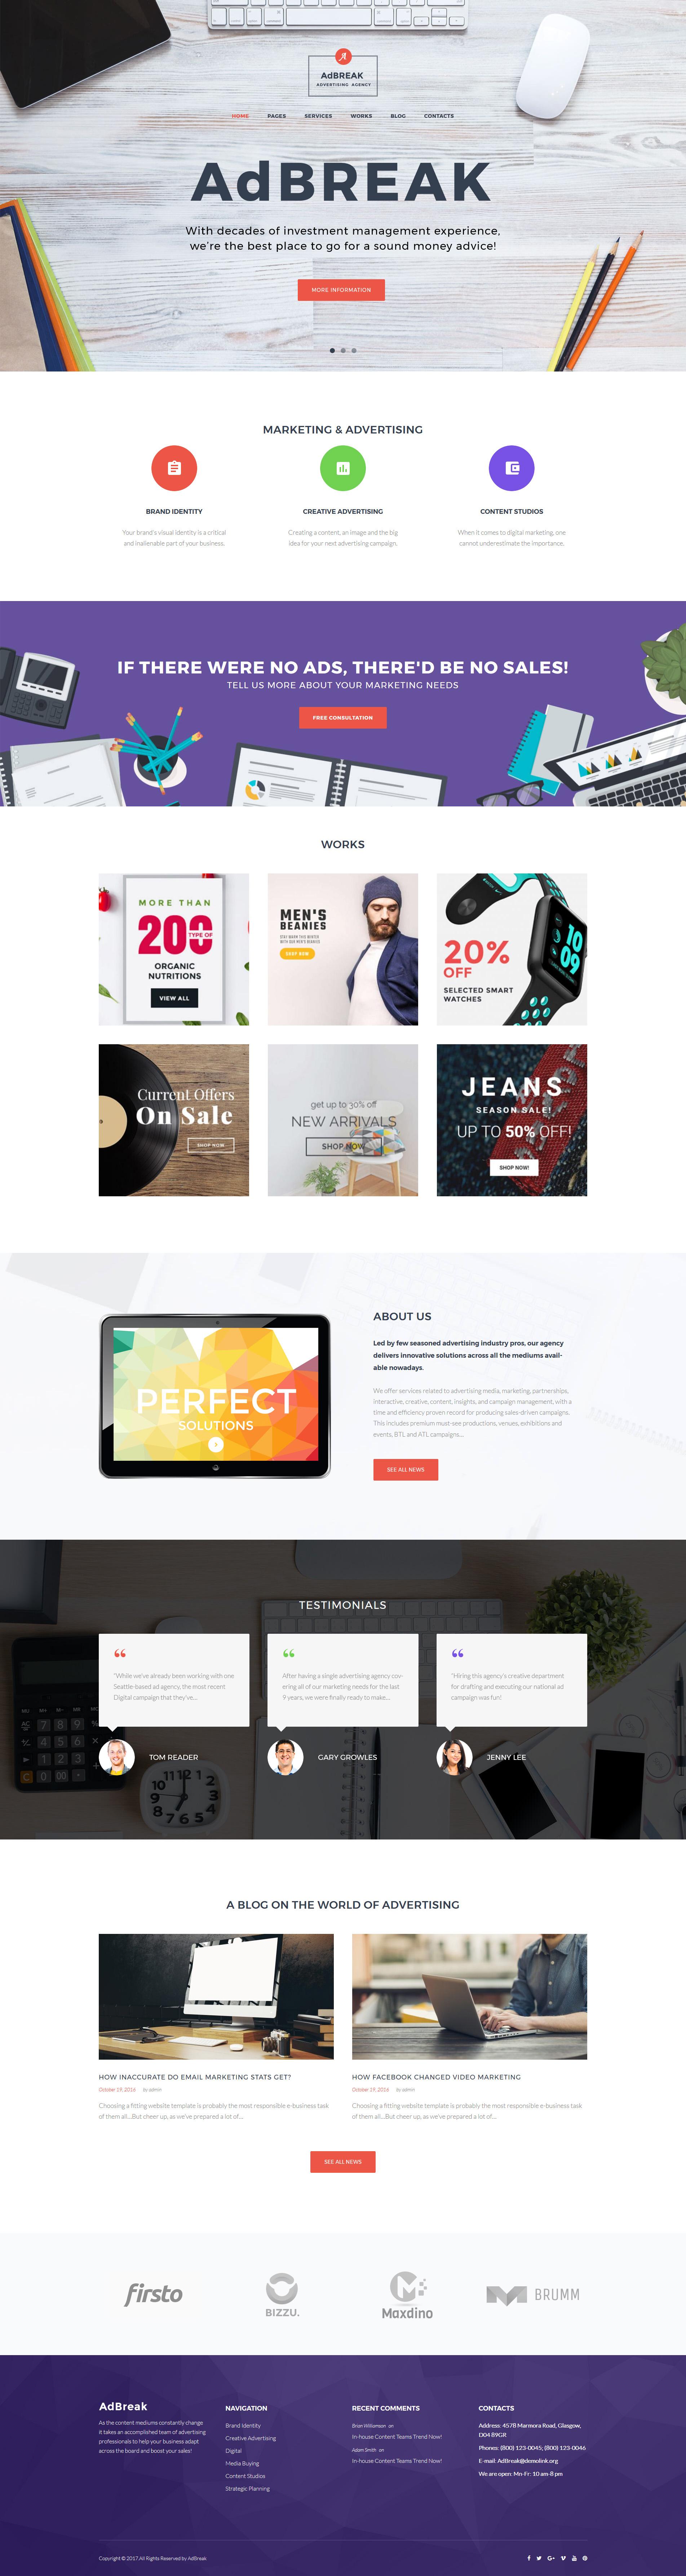 AdBreak - Advertising Company Tema WordPress №63502 - captura de tela